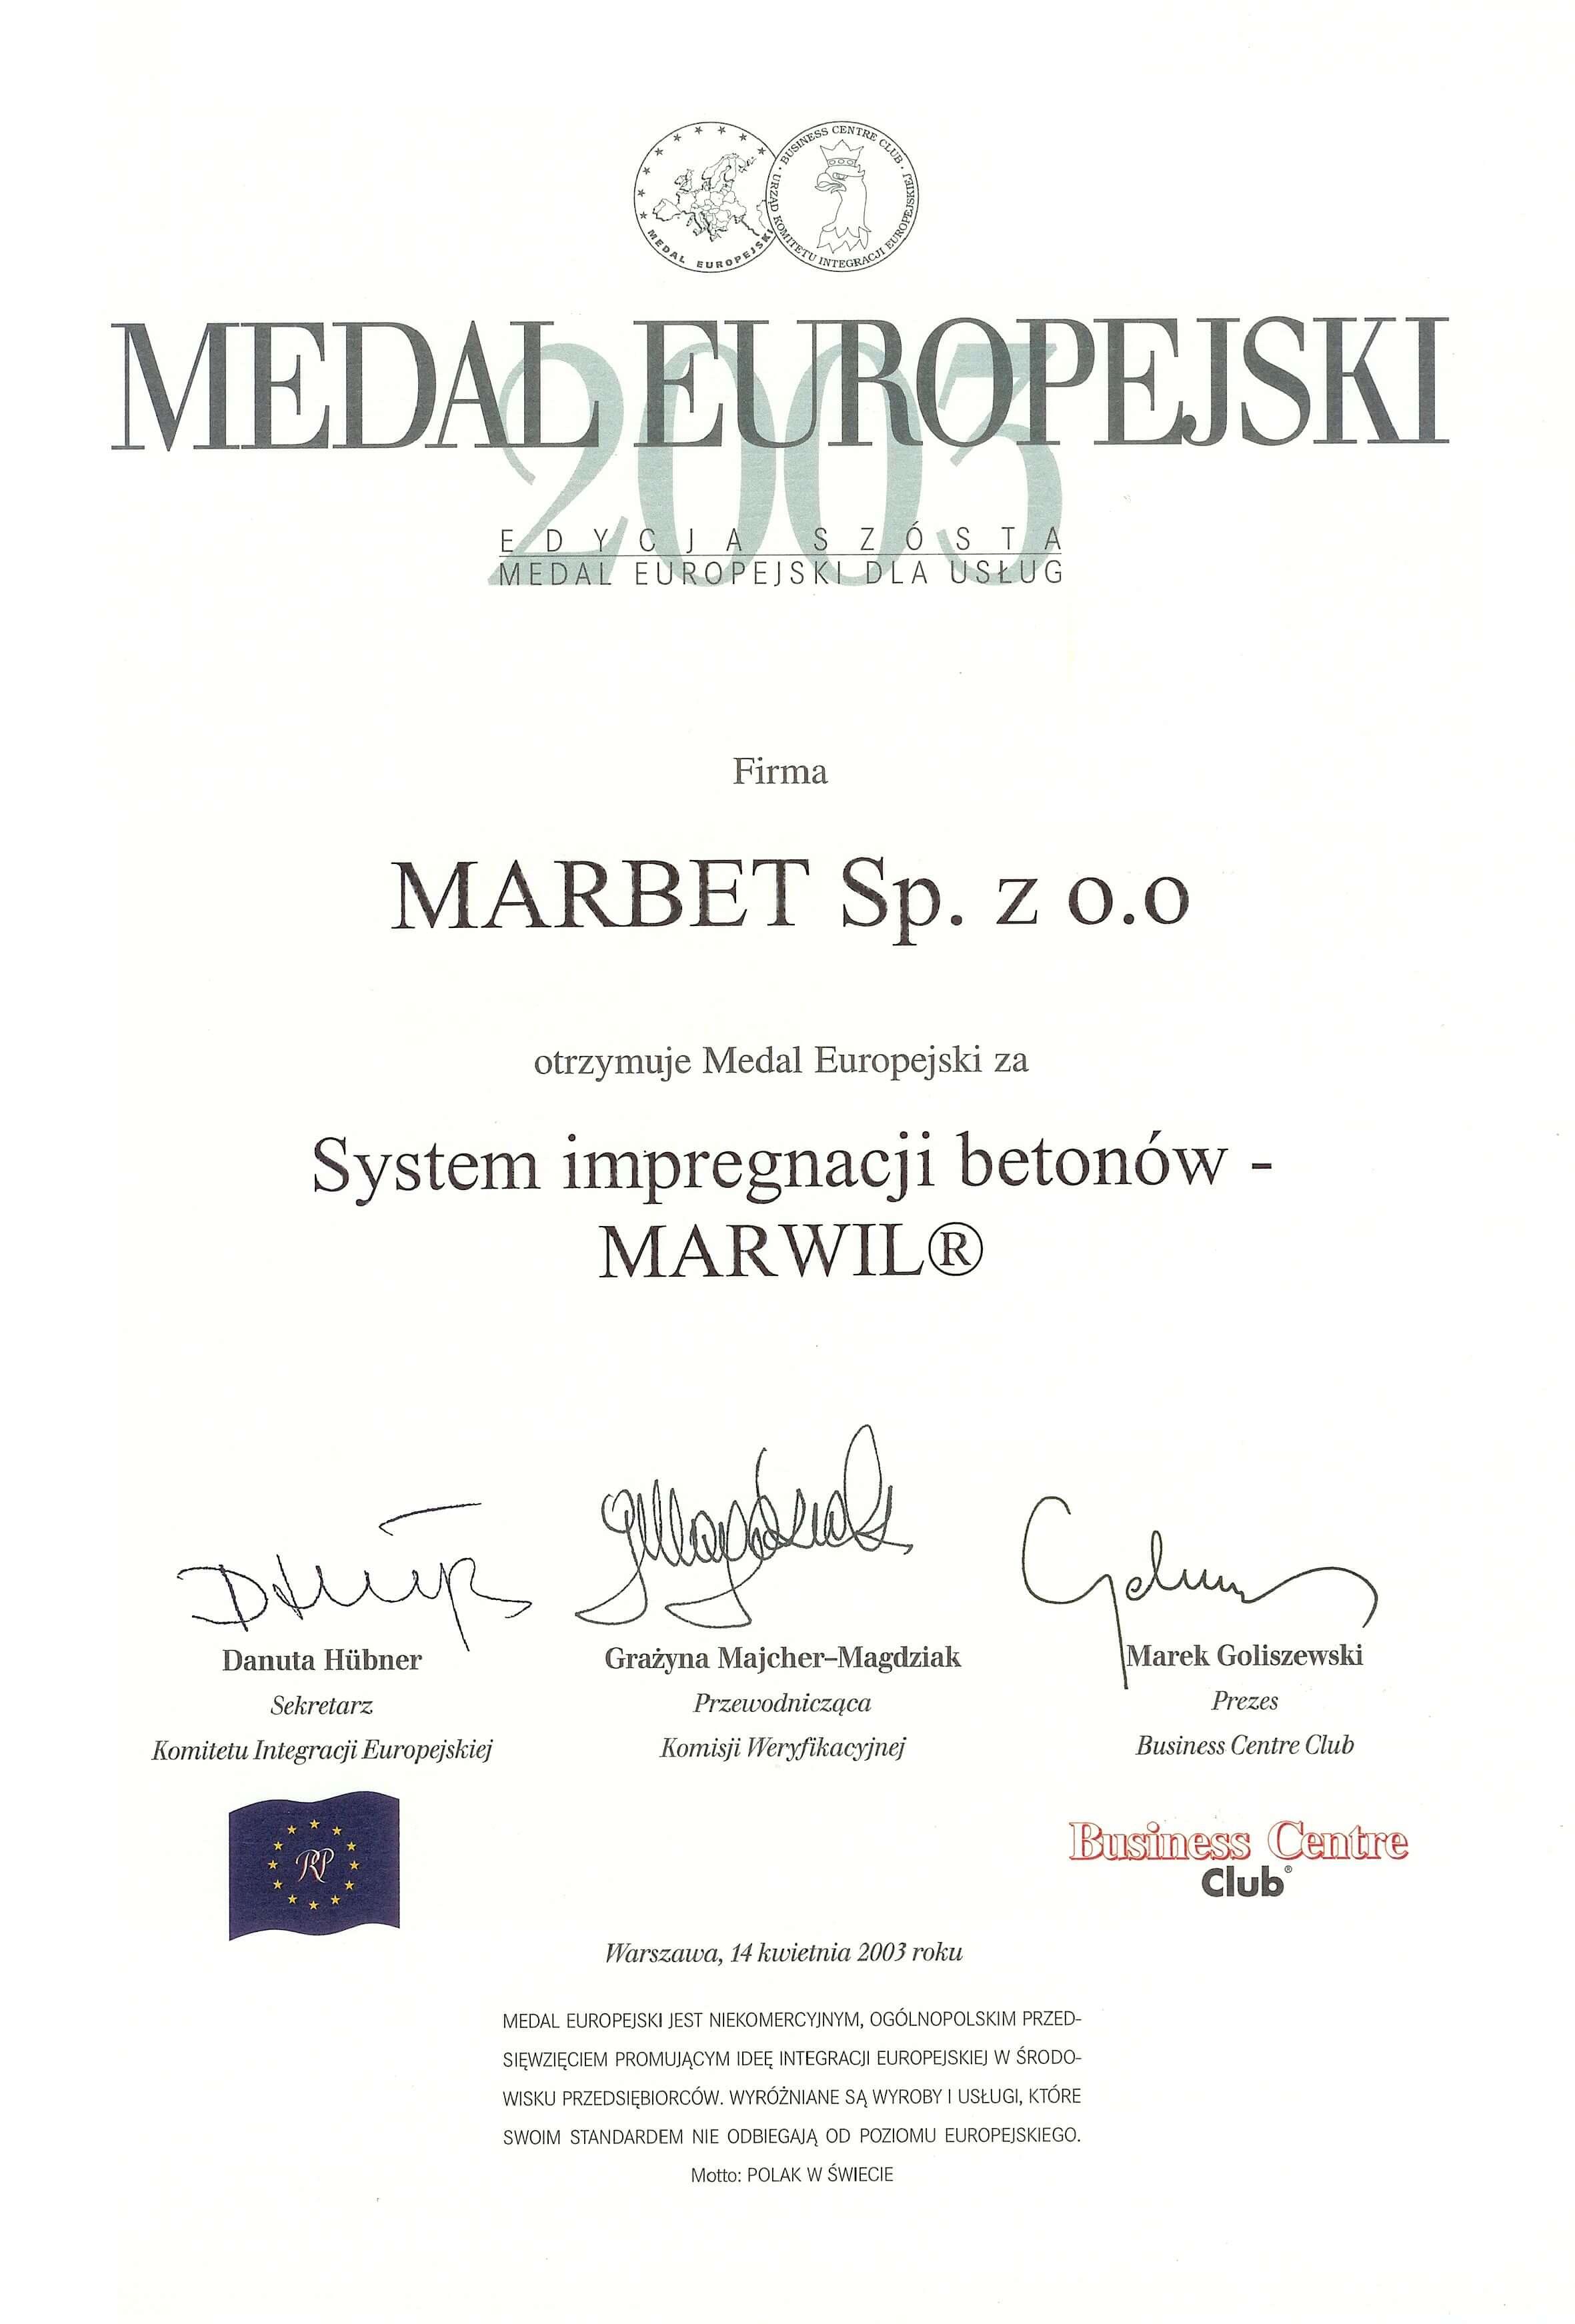 Medal Europejski 2003 - MARWIL- j.pol